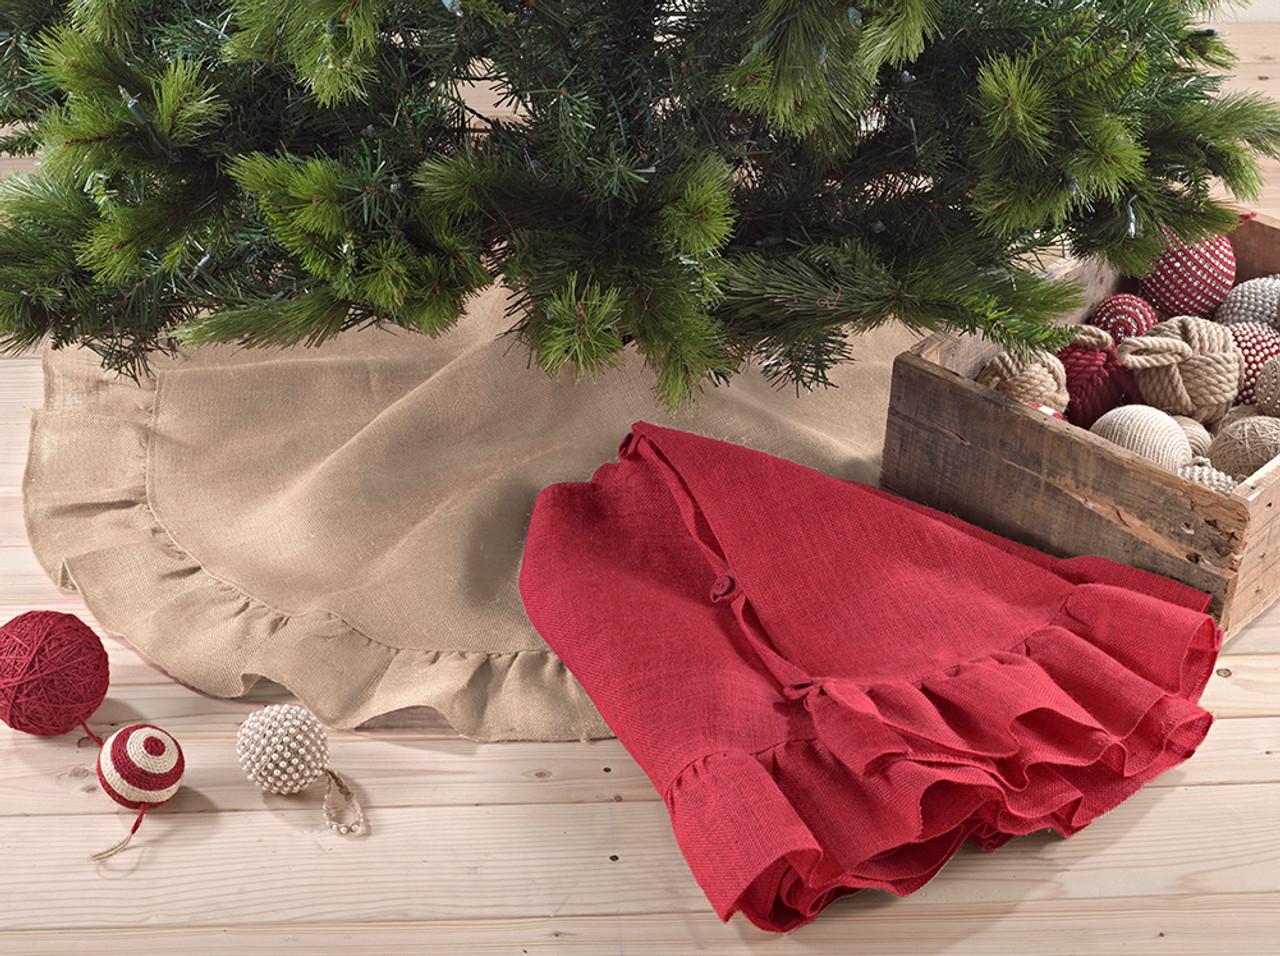 Holiday Decor Ruffle Trim Jute Burlap Xmas Tree Skirt 53 Inch Round Red